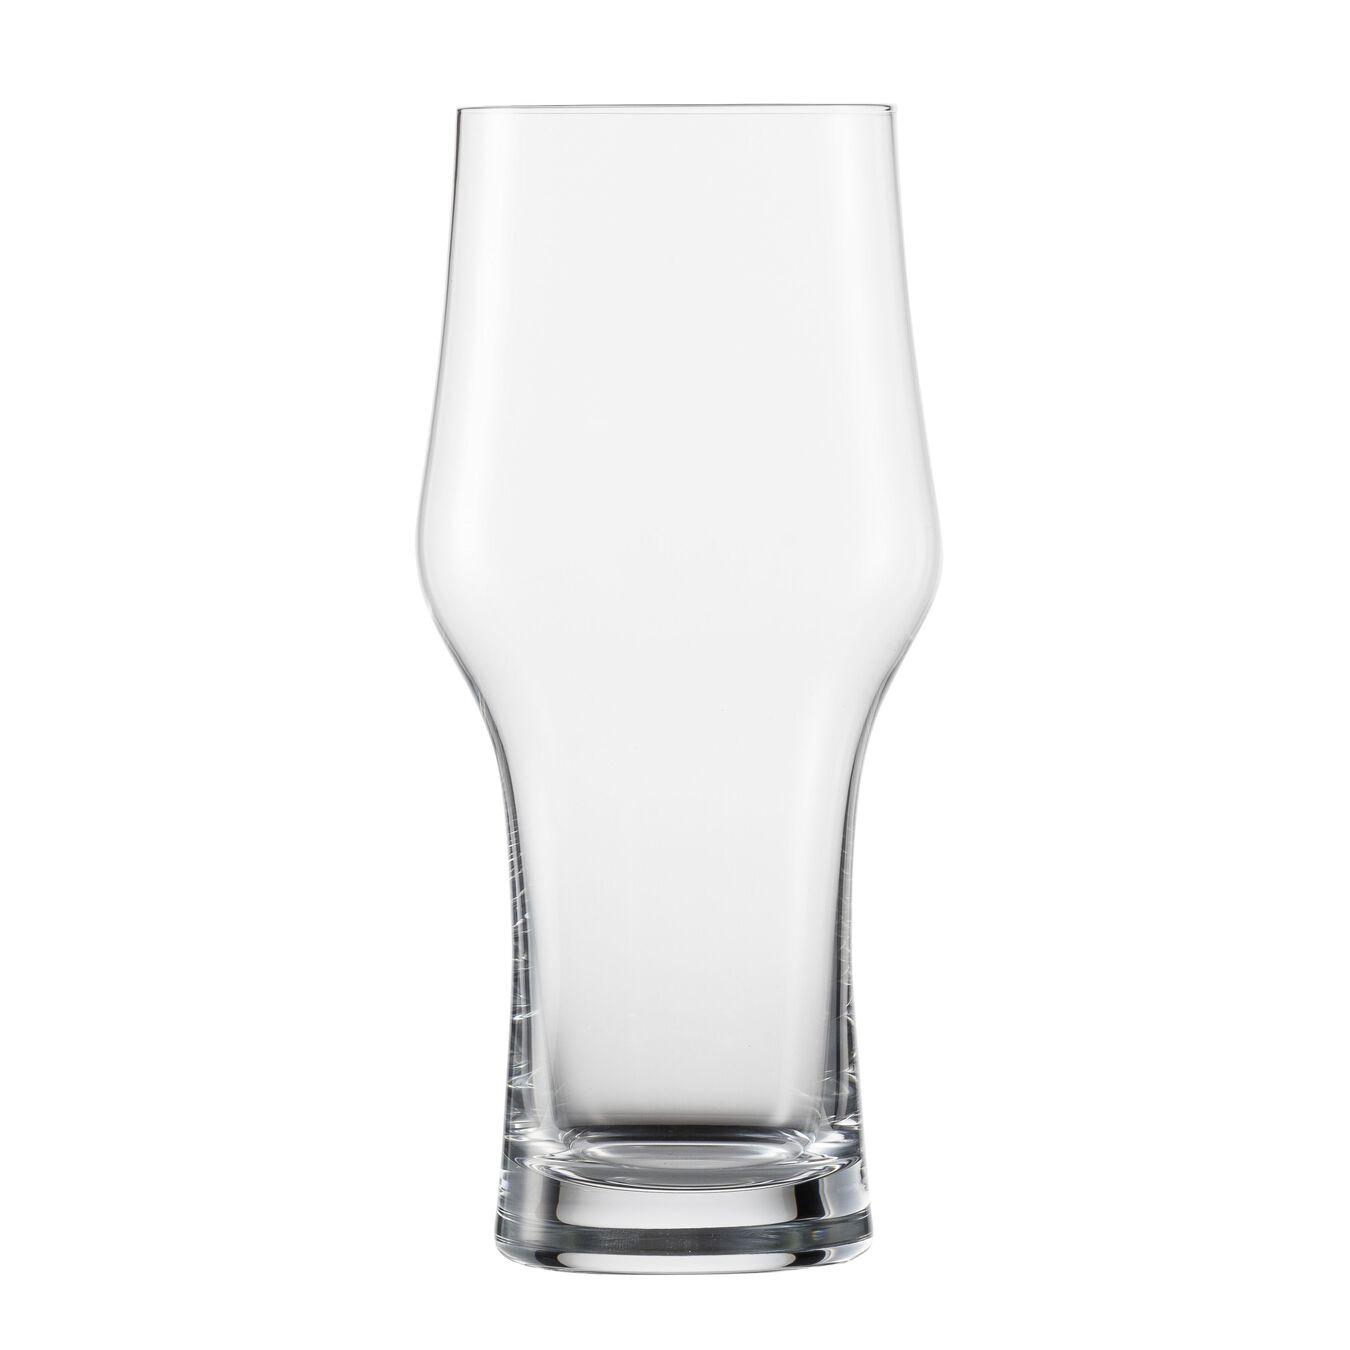 Copo para cerveja 540 ml,,large 1